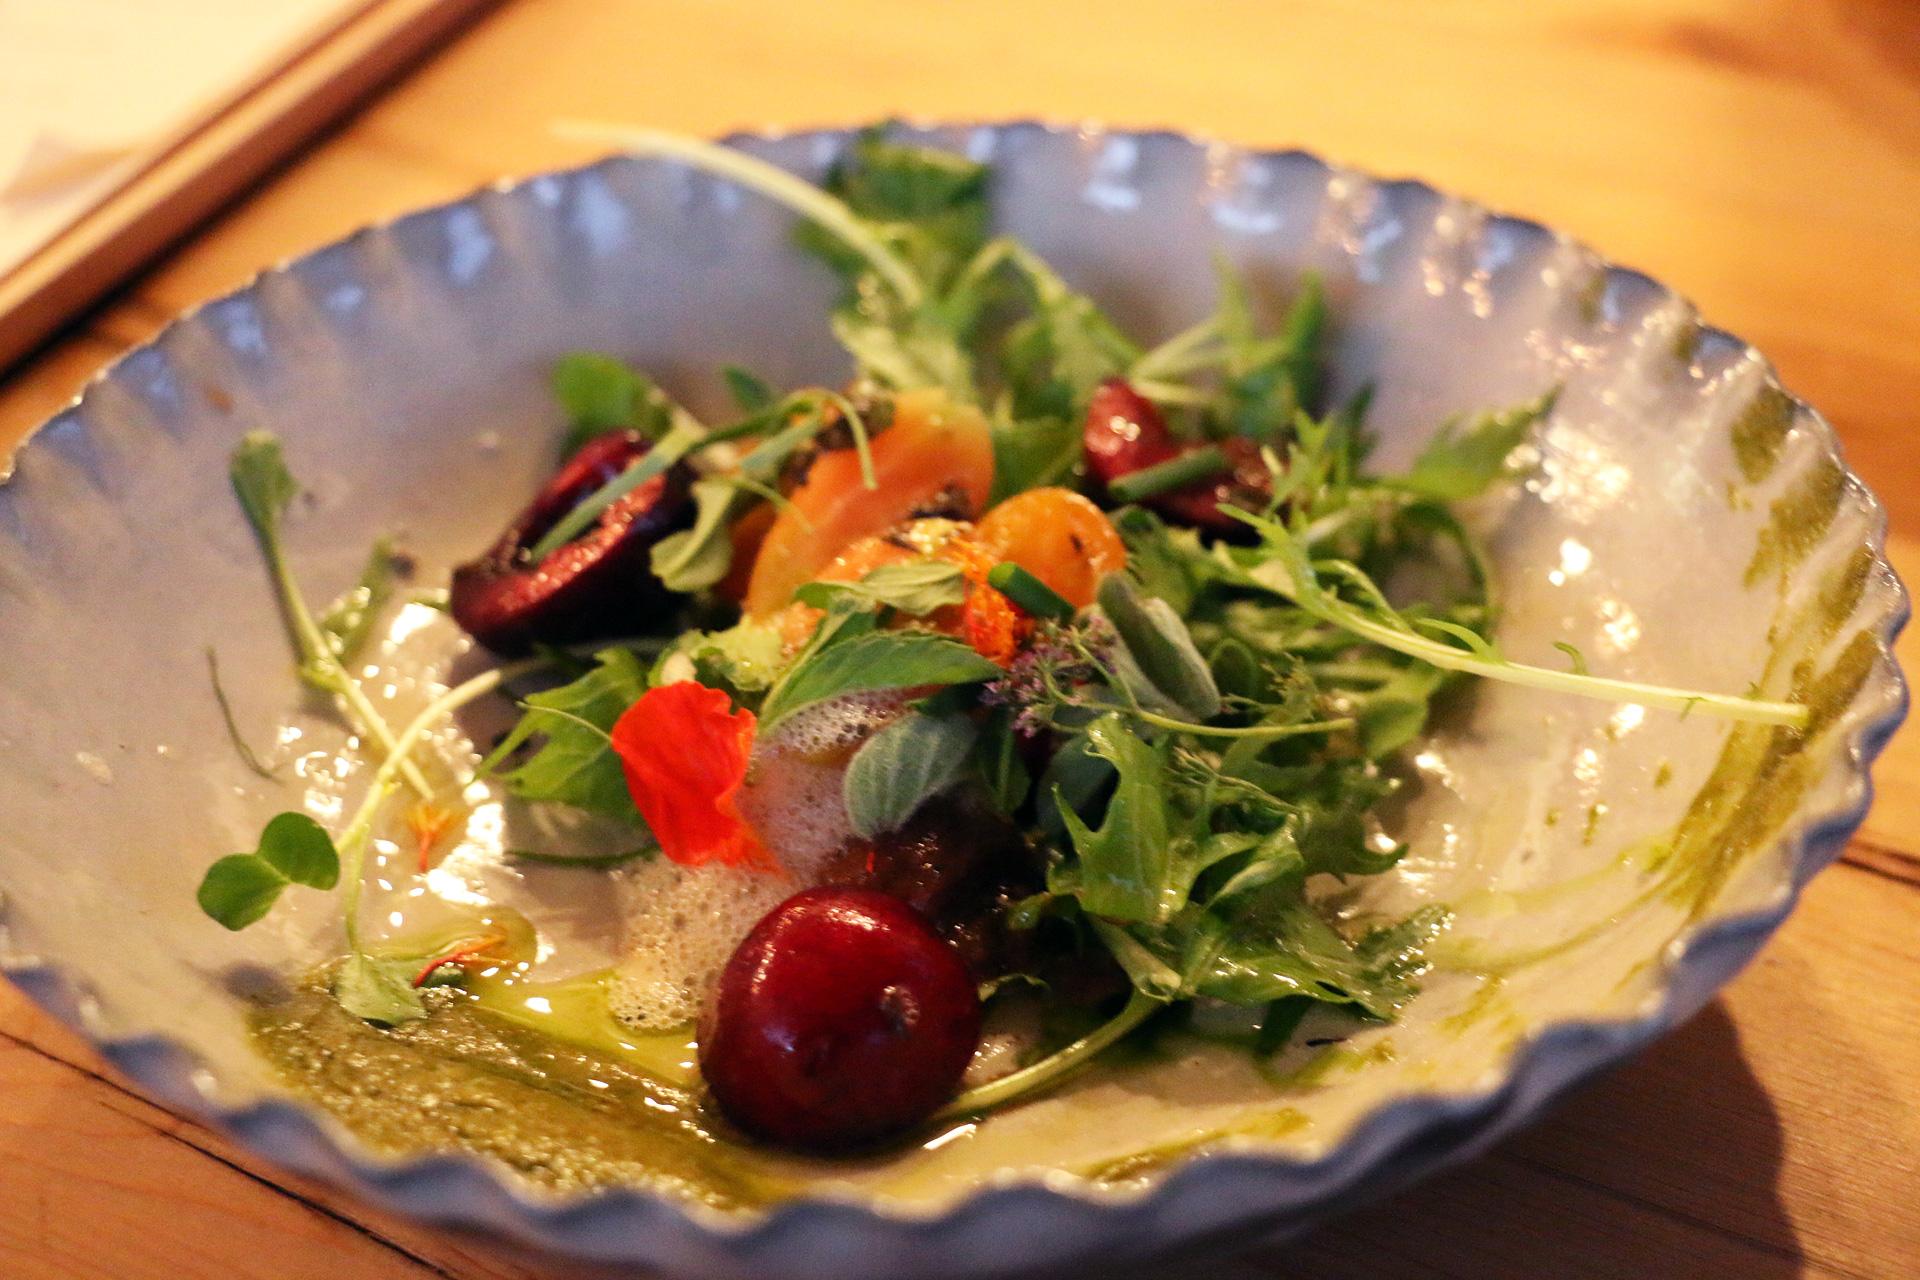 Tomato and cherry salad.